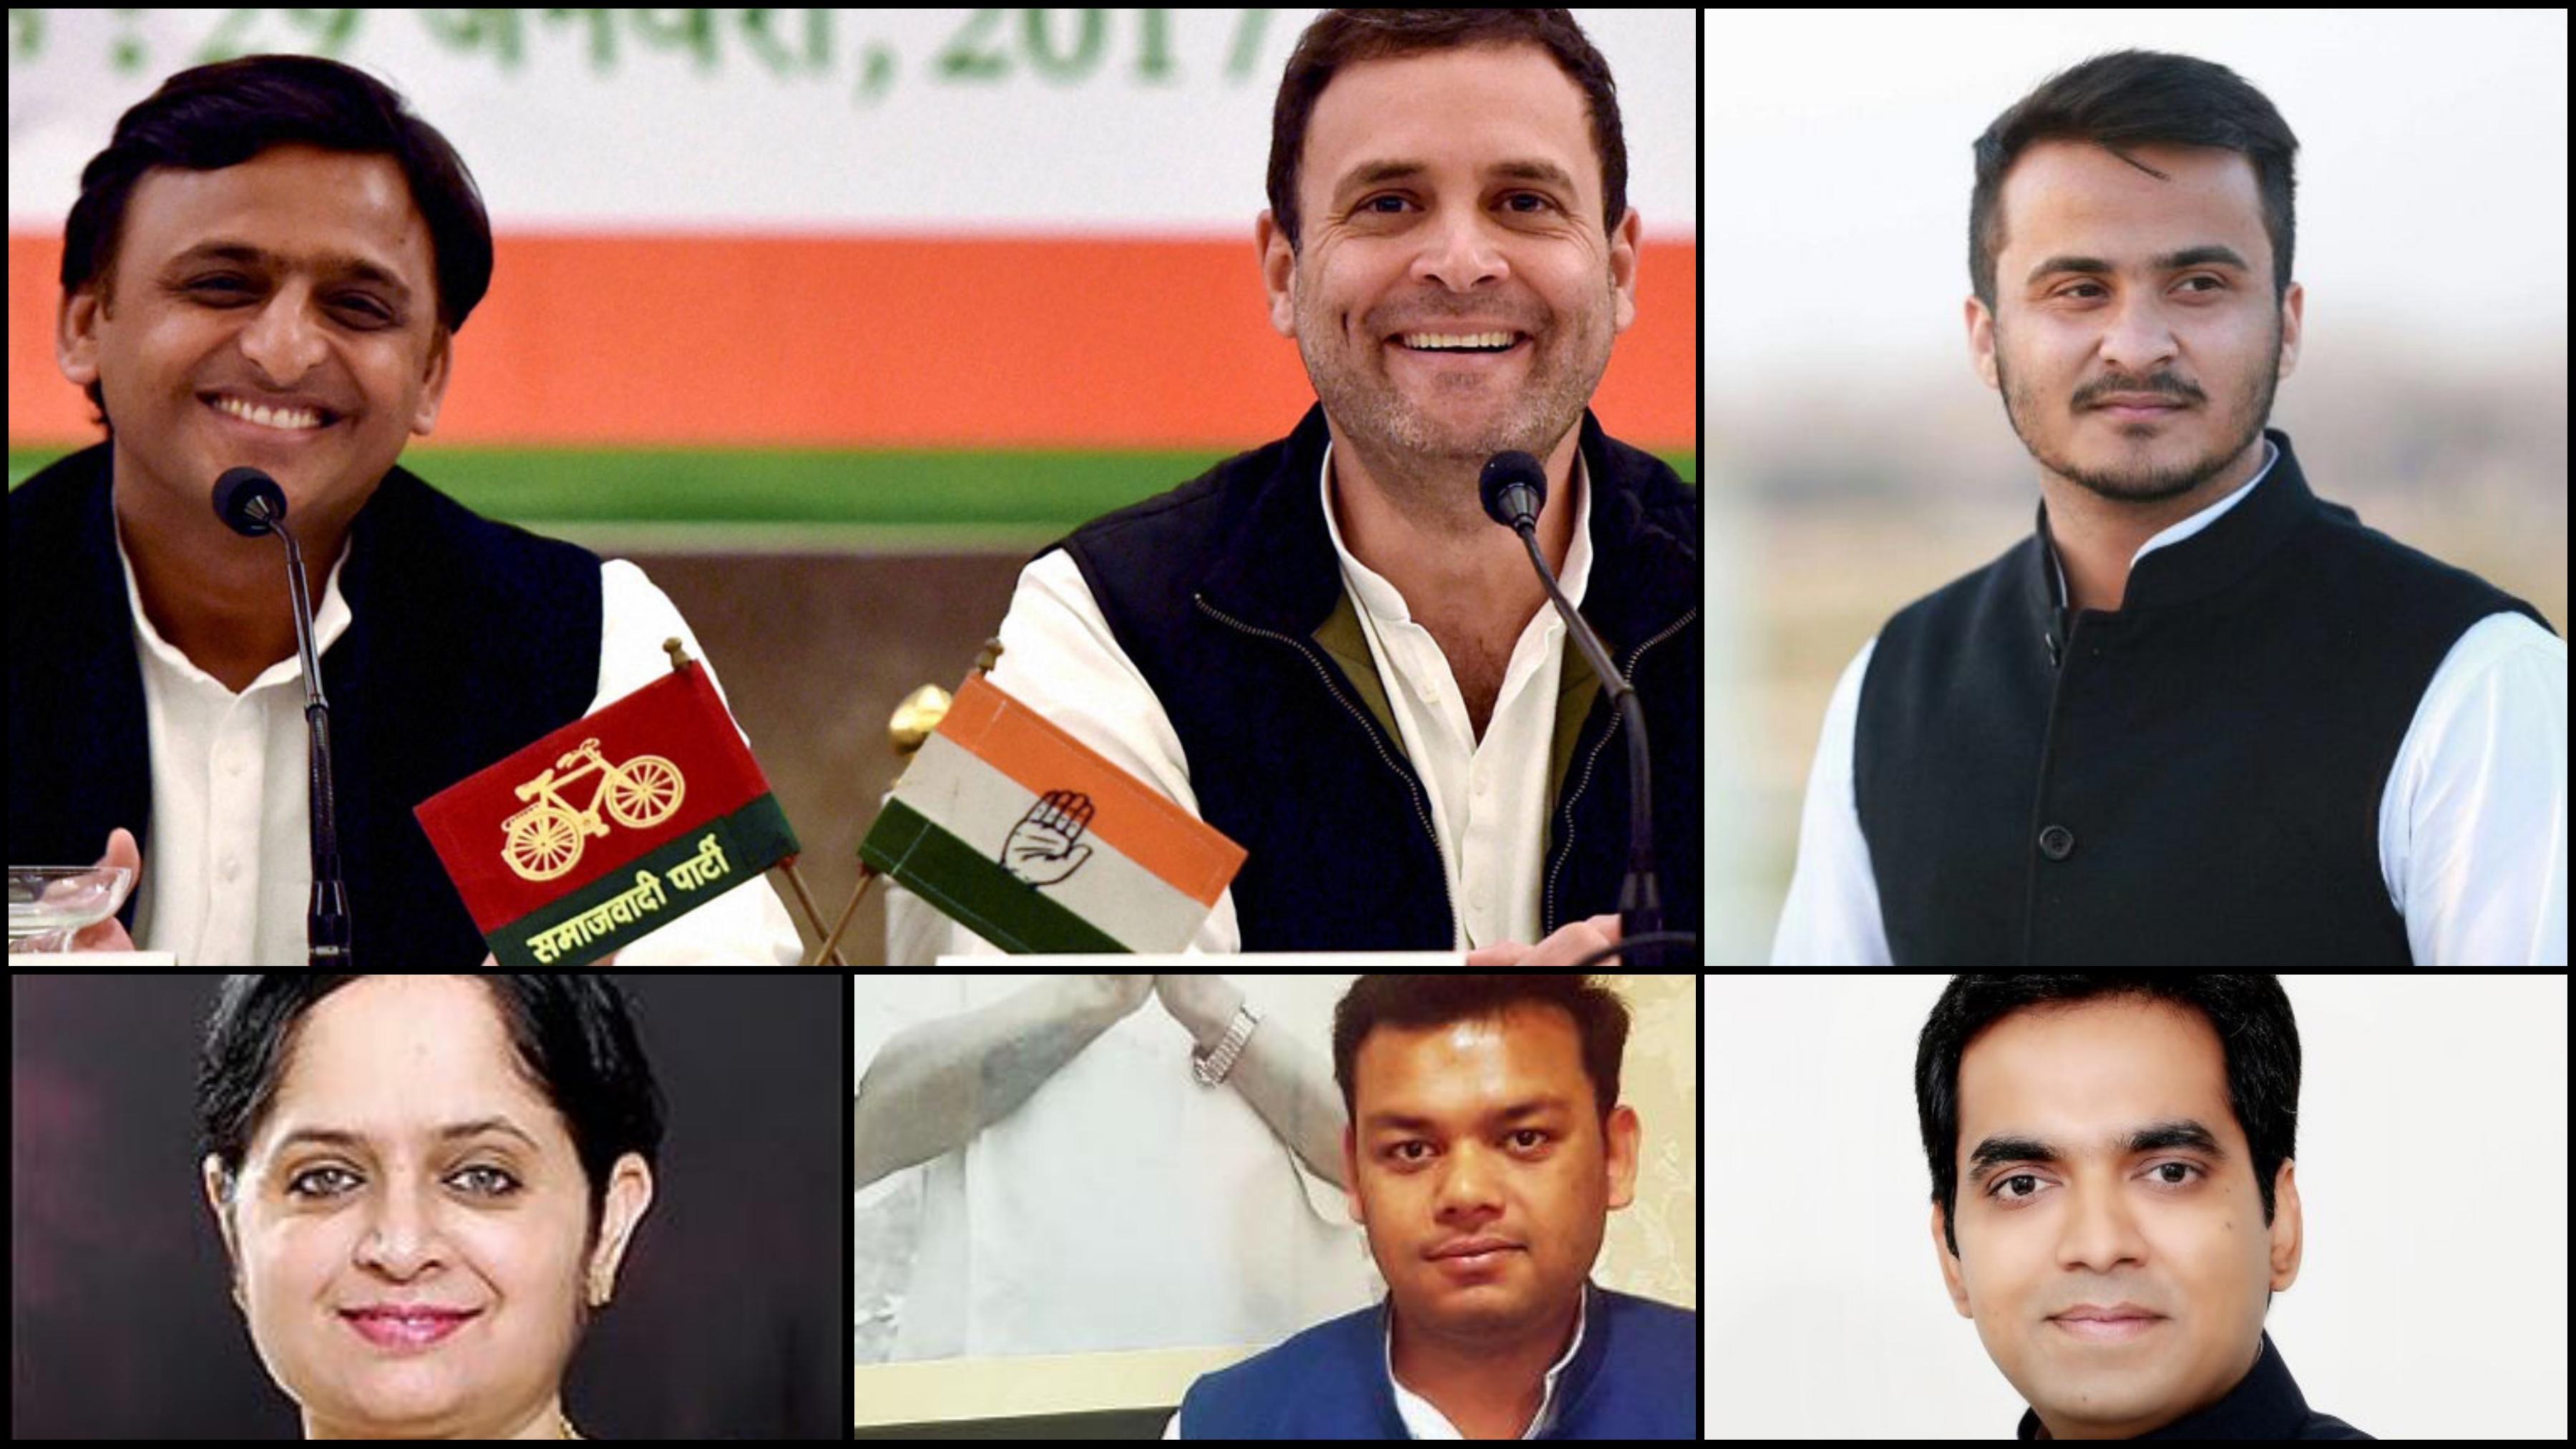 (L-R) UP chief minister Akhilesh Yadav with Rahul Gandhi, Abdullah Azam Khan, Pankaj Singh, Sandeep Singh and Mriganka Singh. Credit: Twitter/PTI